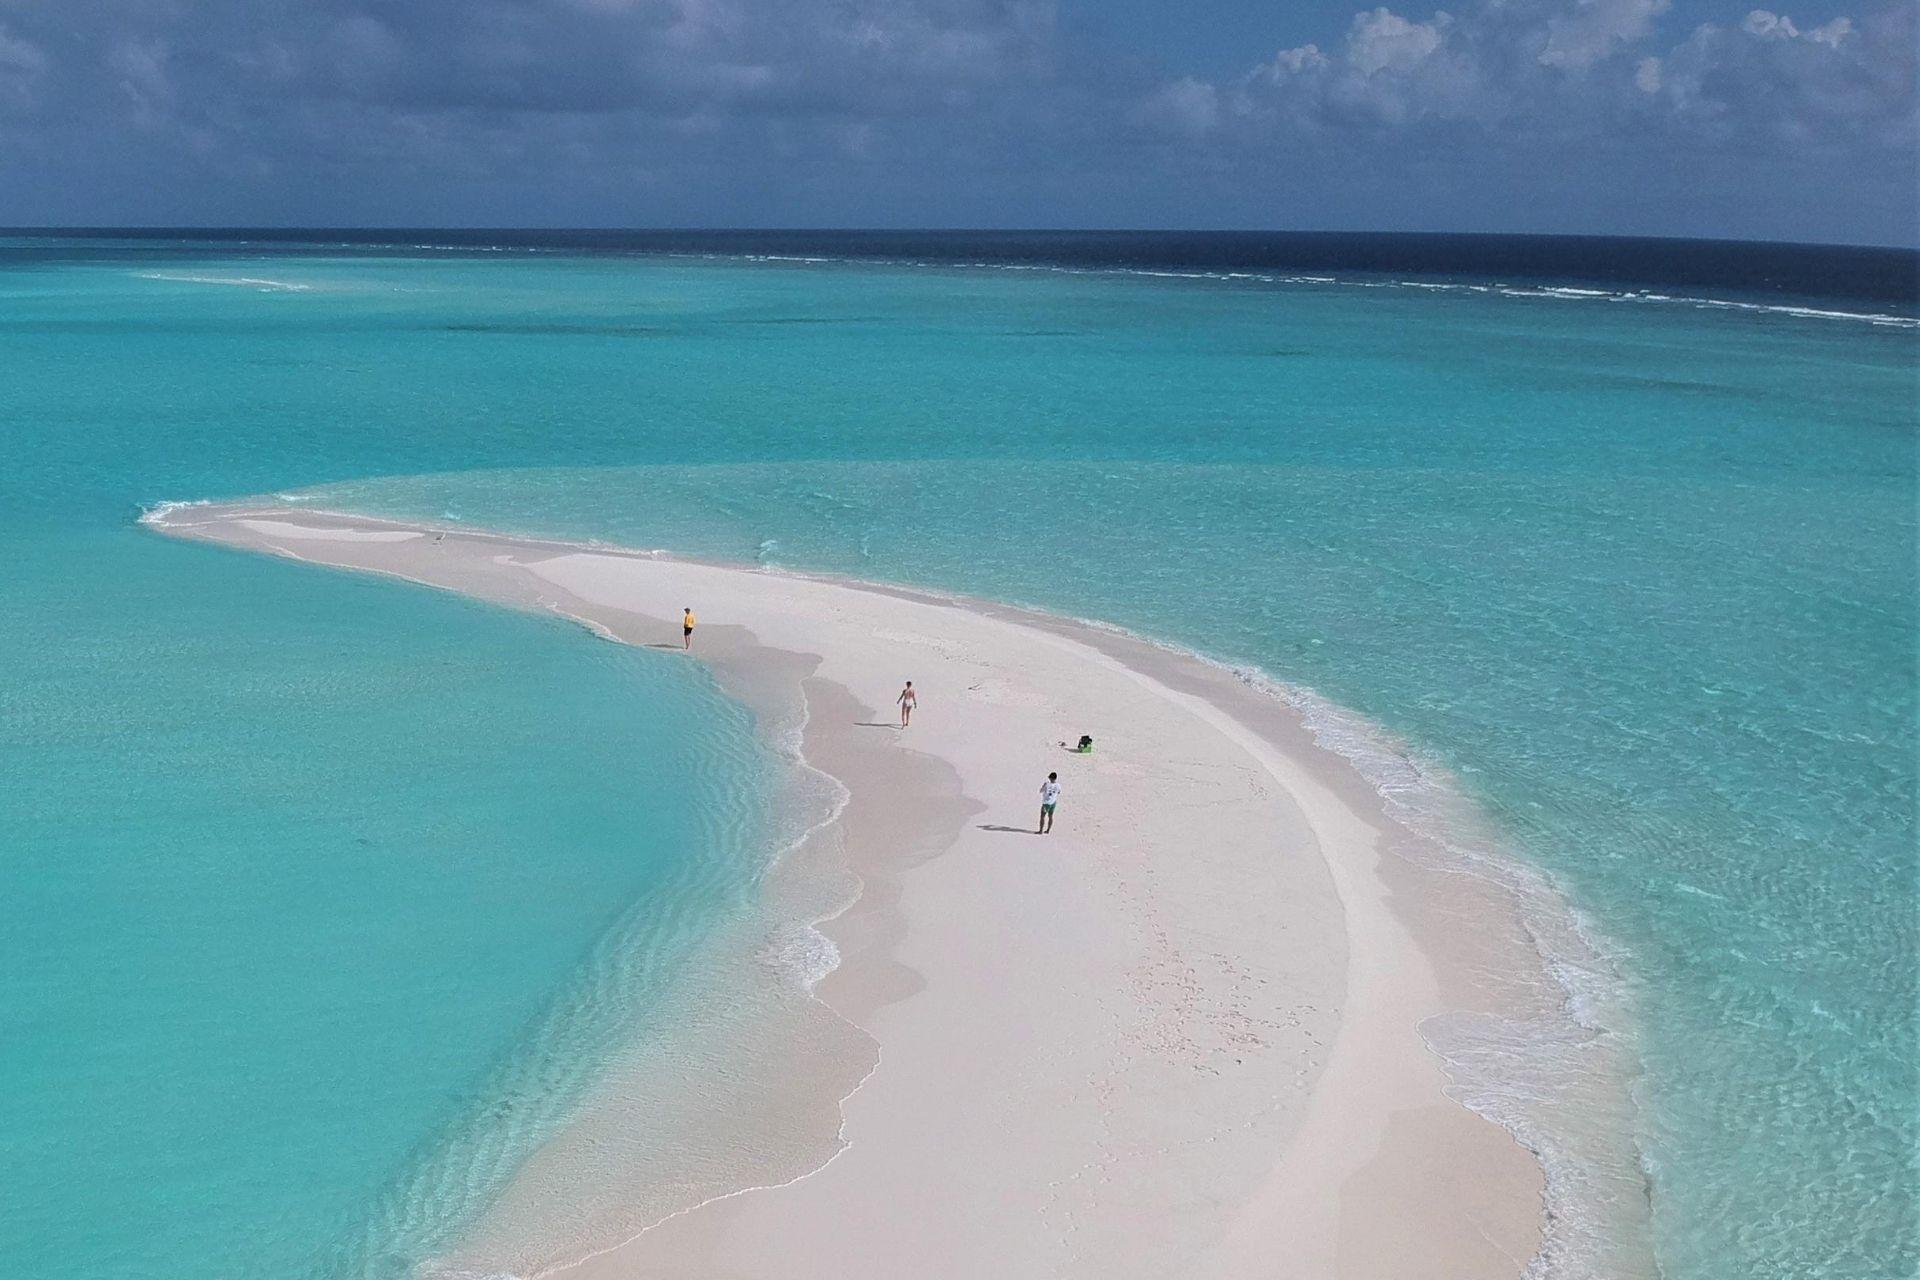 Maldives Snorkeling, Sandbank & Sunset Cruise Day Trip